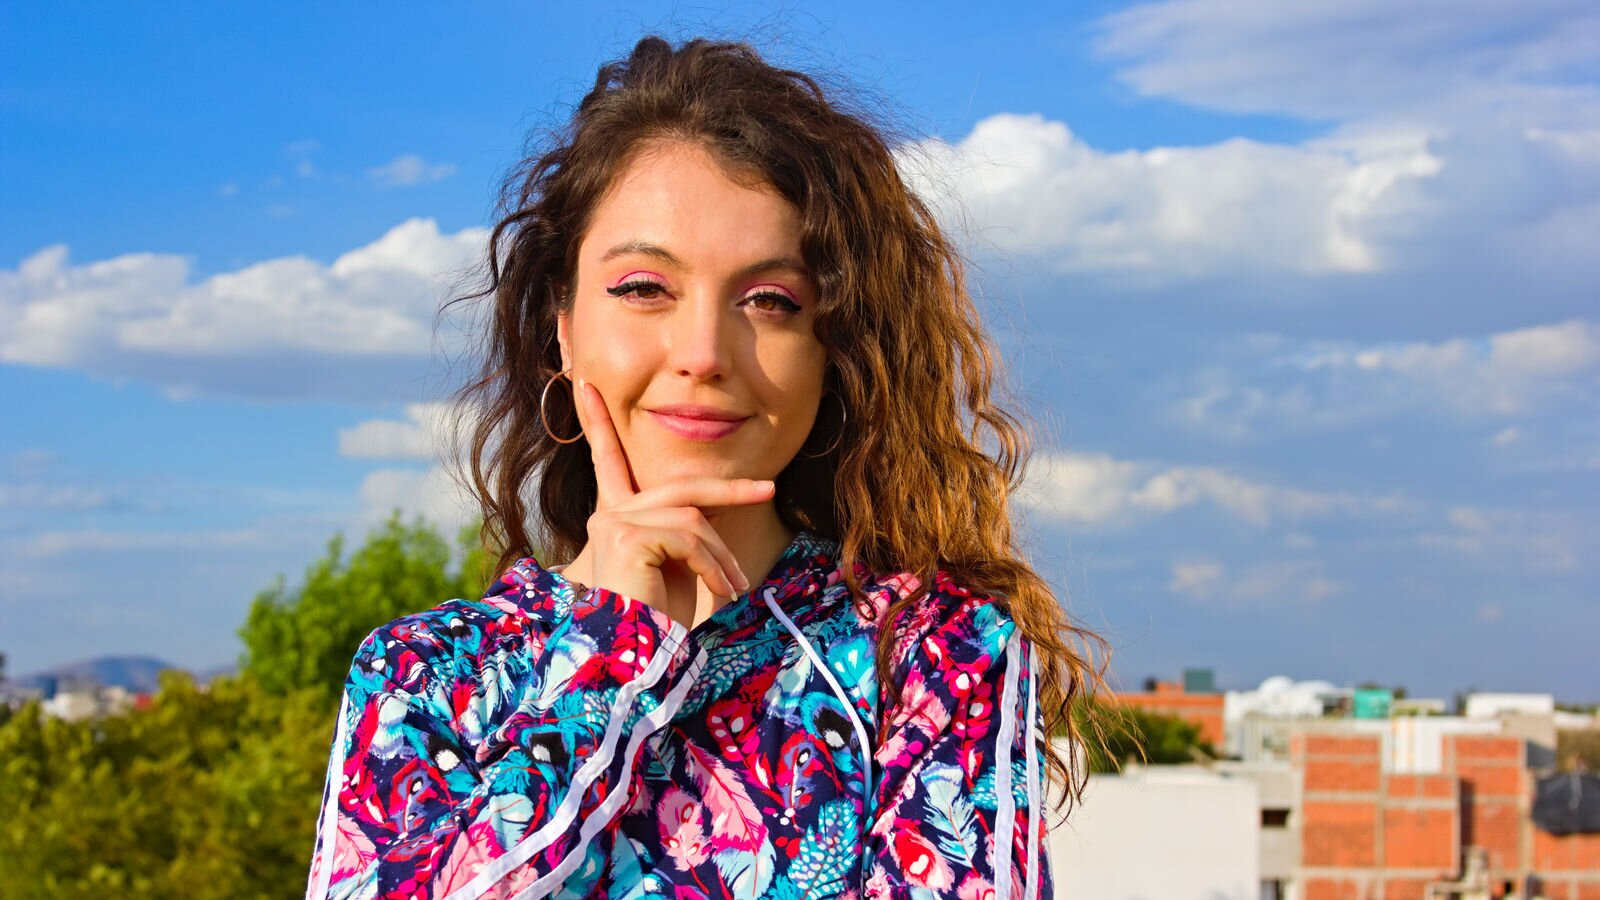 MelissaMarquez